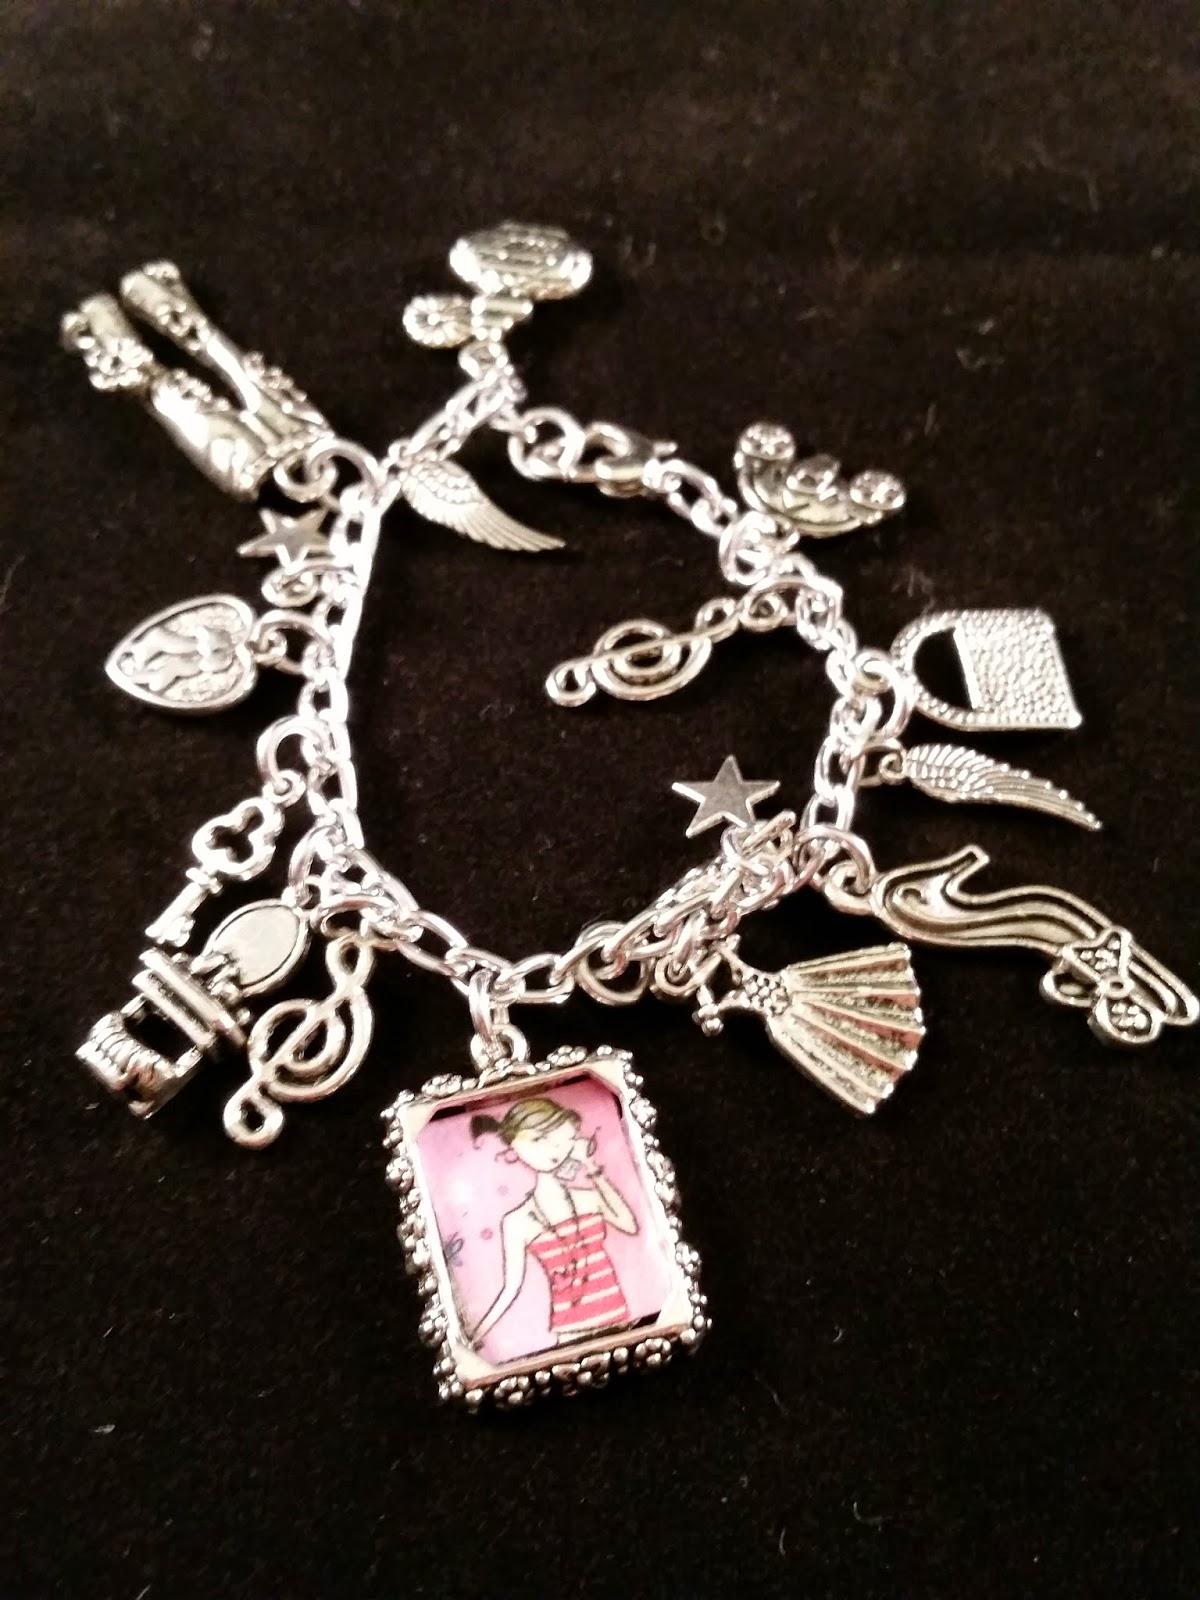 cinderella charm bracelet from framily jewelry giveaway